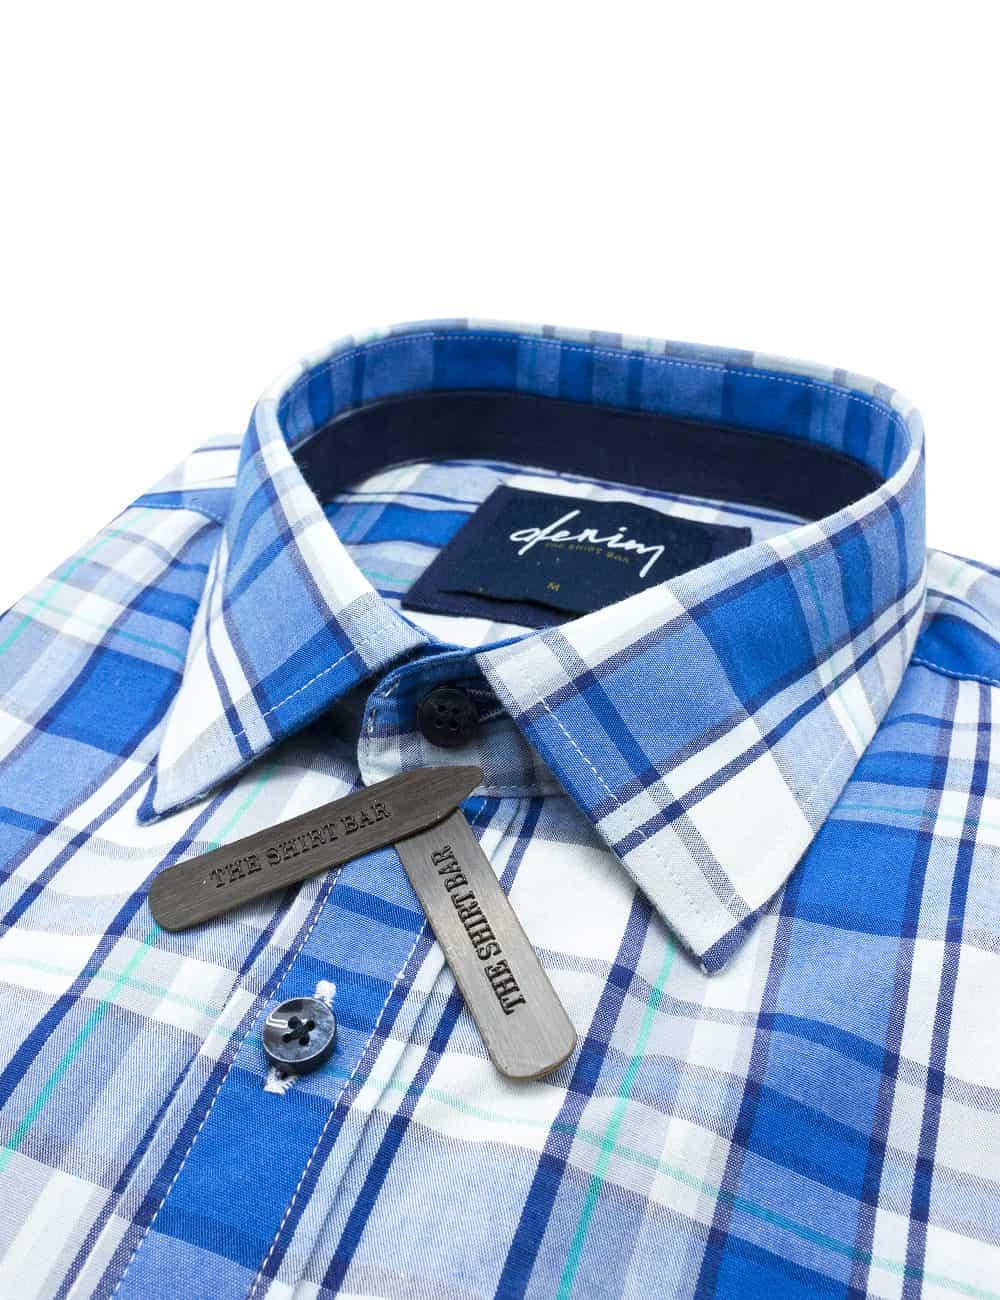 Relaxed Fit Blue Checks Denim Collection 100% Cotton Long Sleeve Single Cuff Shirt RF2BA10.7